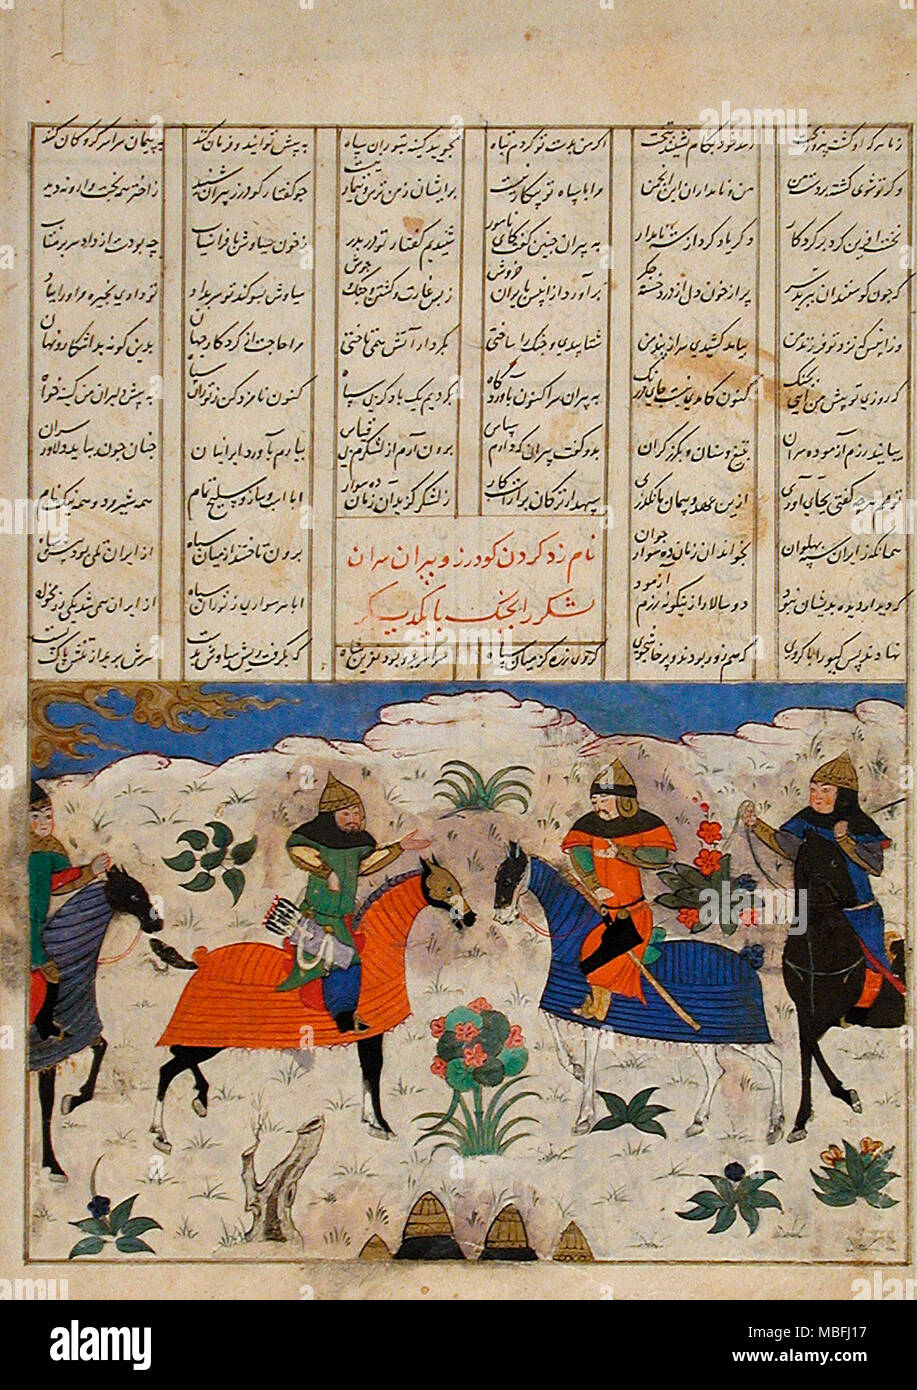 Meeting of Two Muslim Generals - Stock Image